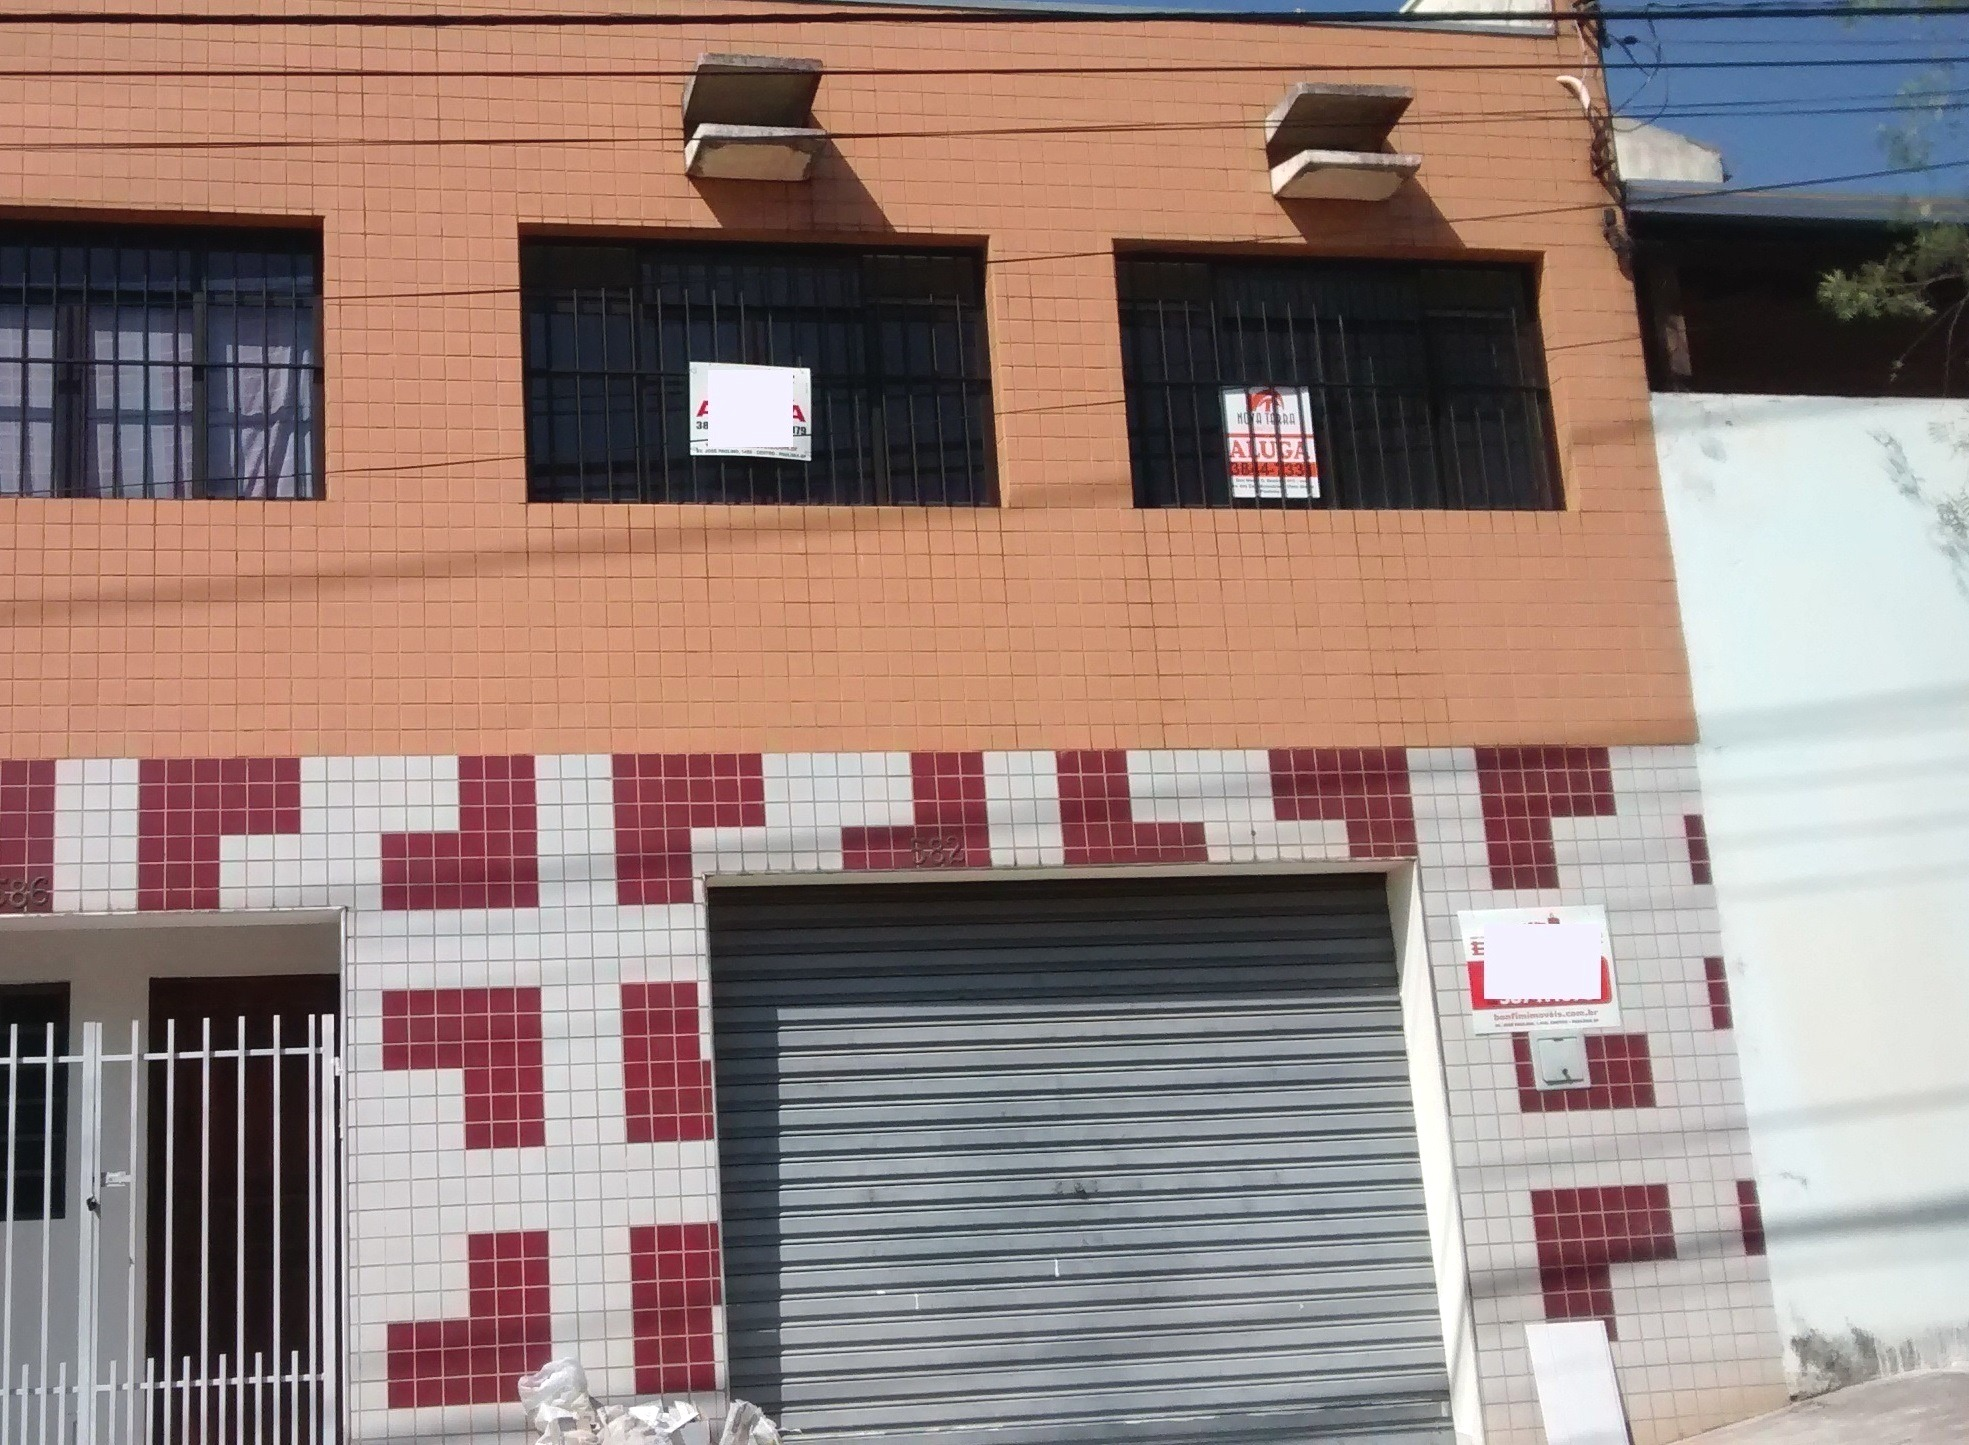 comprar ou alugar salao no bairro vista alegre na cidade de paulínia-sp